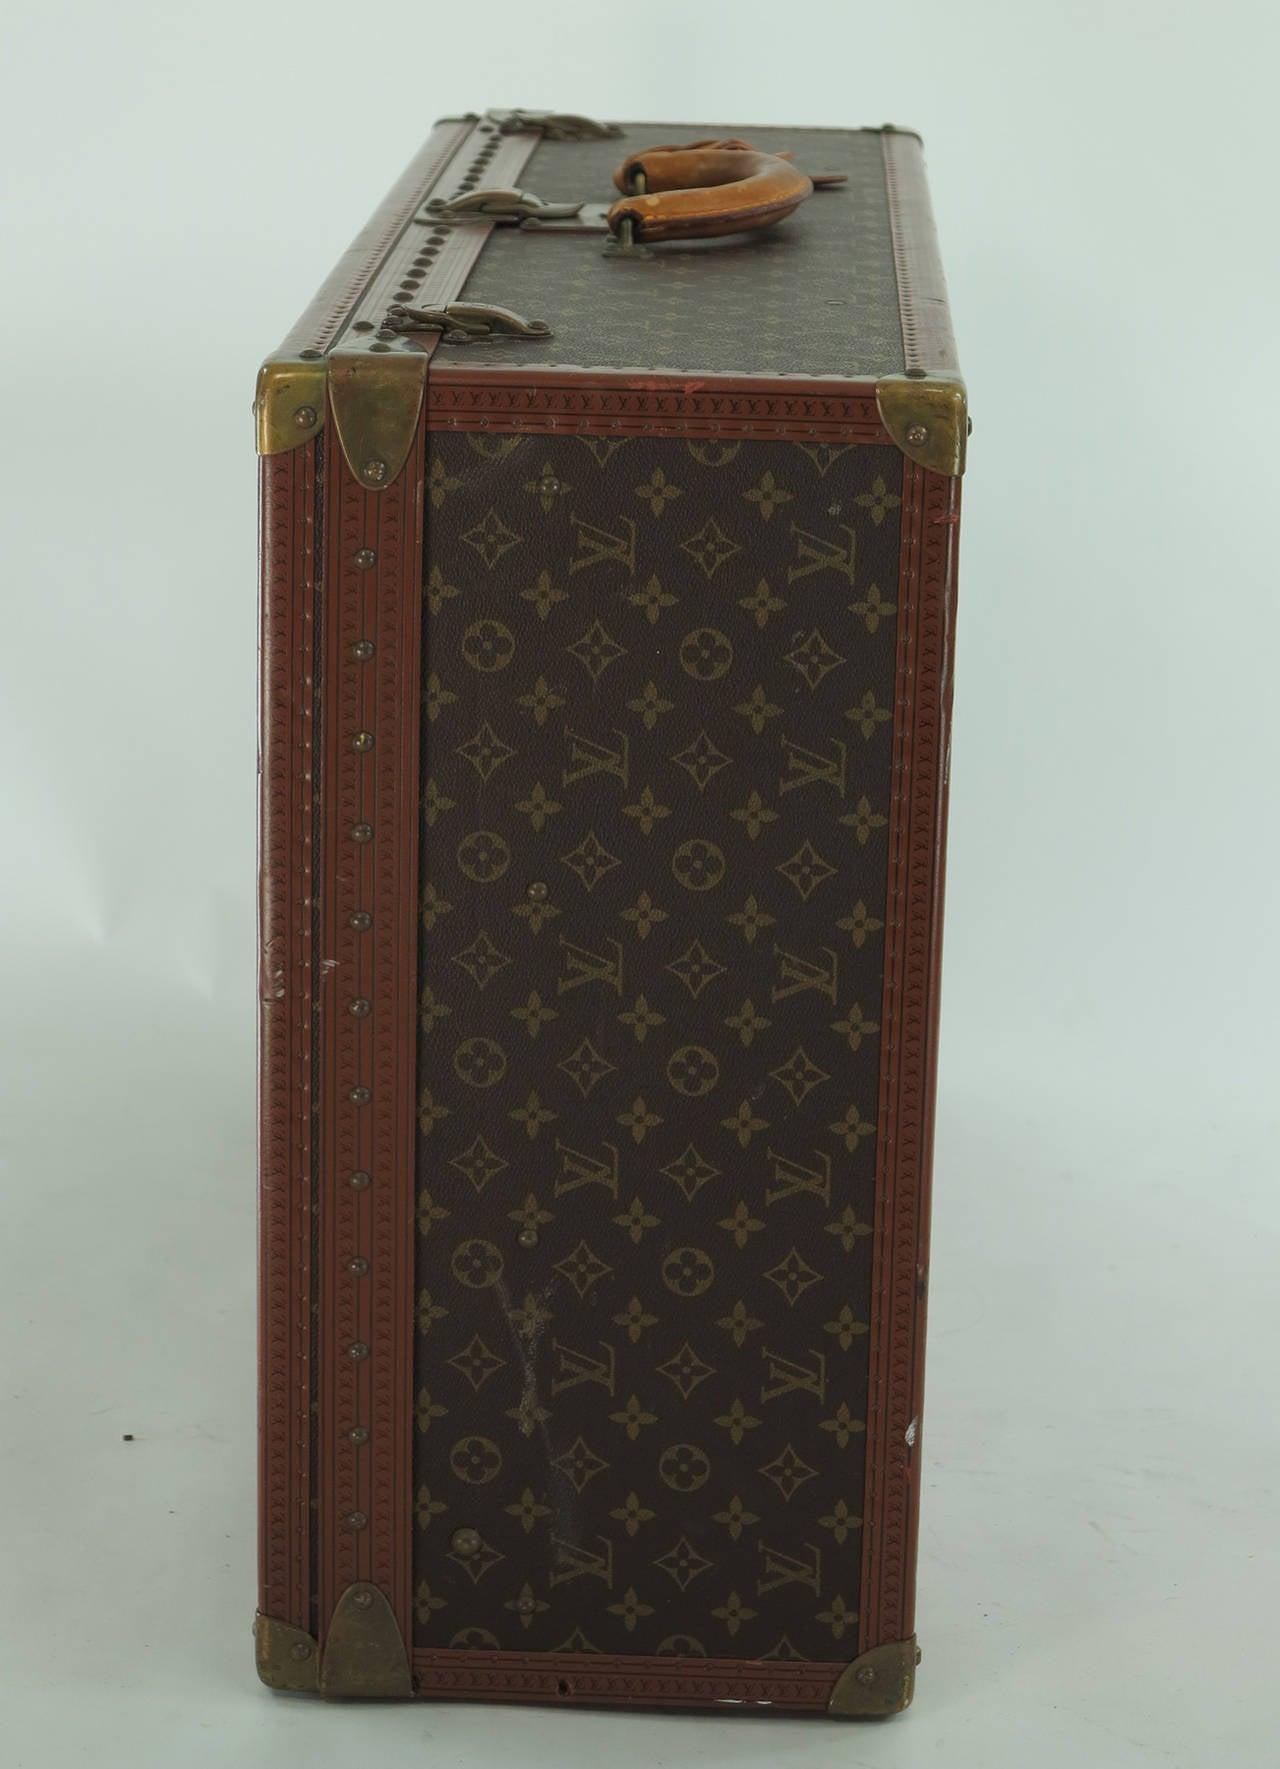 Louis Vuitton Alzar 80 monogram hardside suitcase/trunk 9